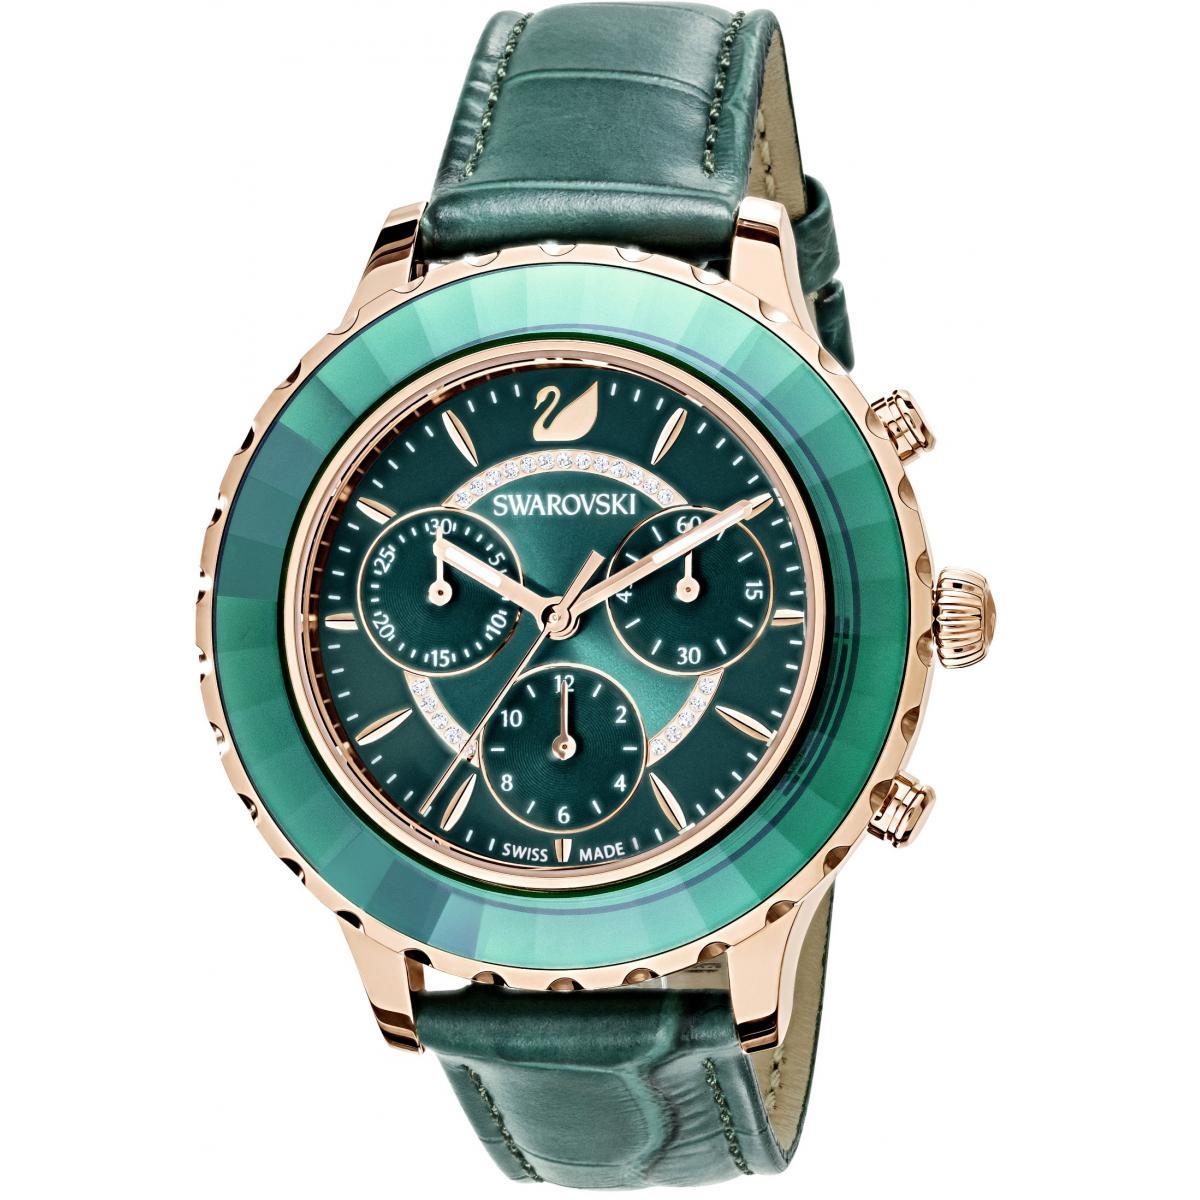 Montre Swarovski Montre 5452498 - Montre Octea Lux Cuir - Swarovski montres - Modalova